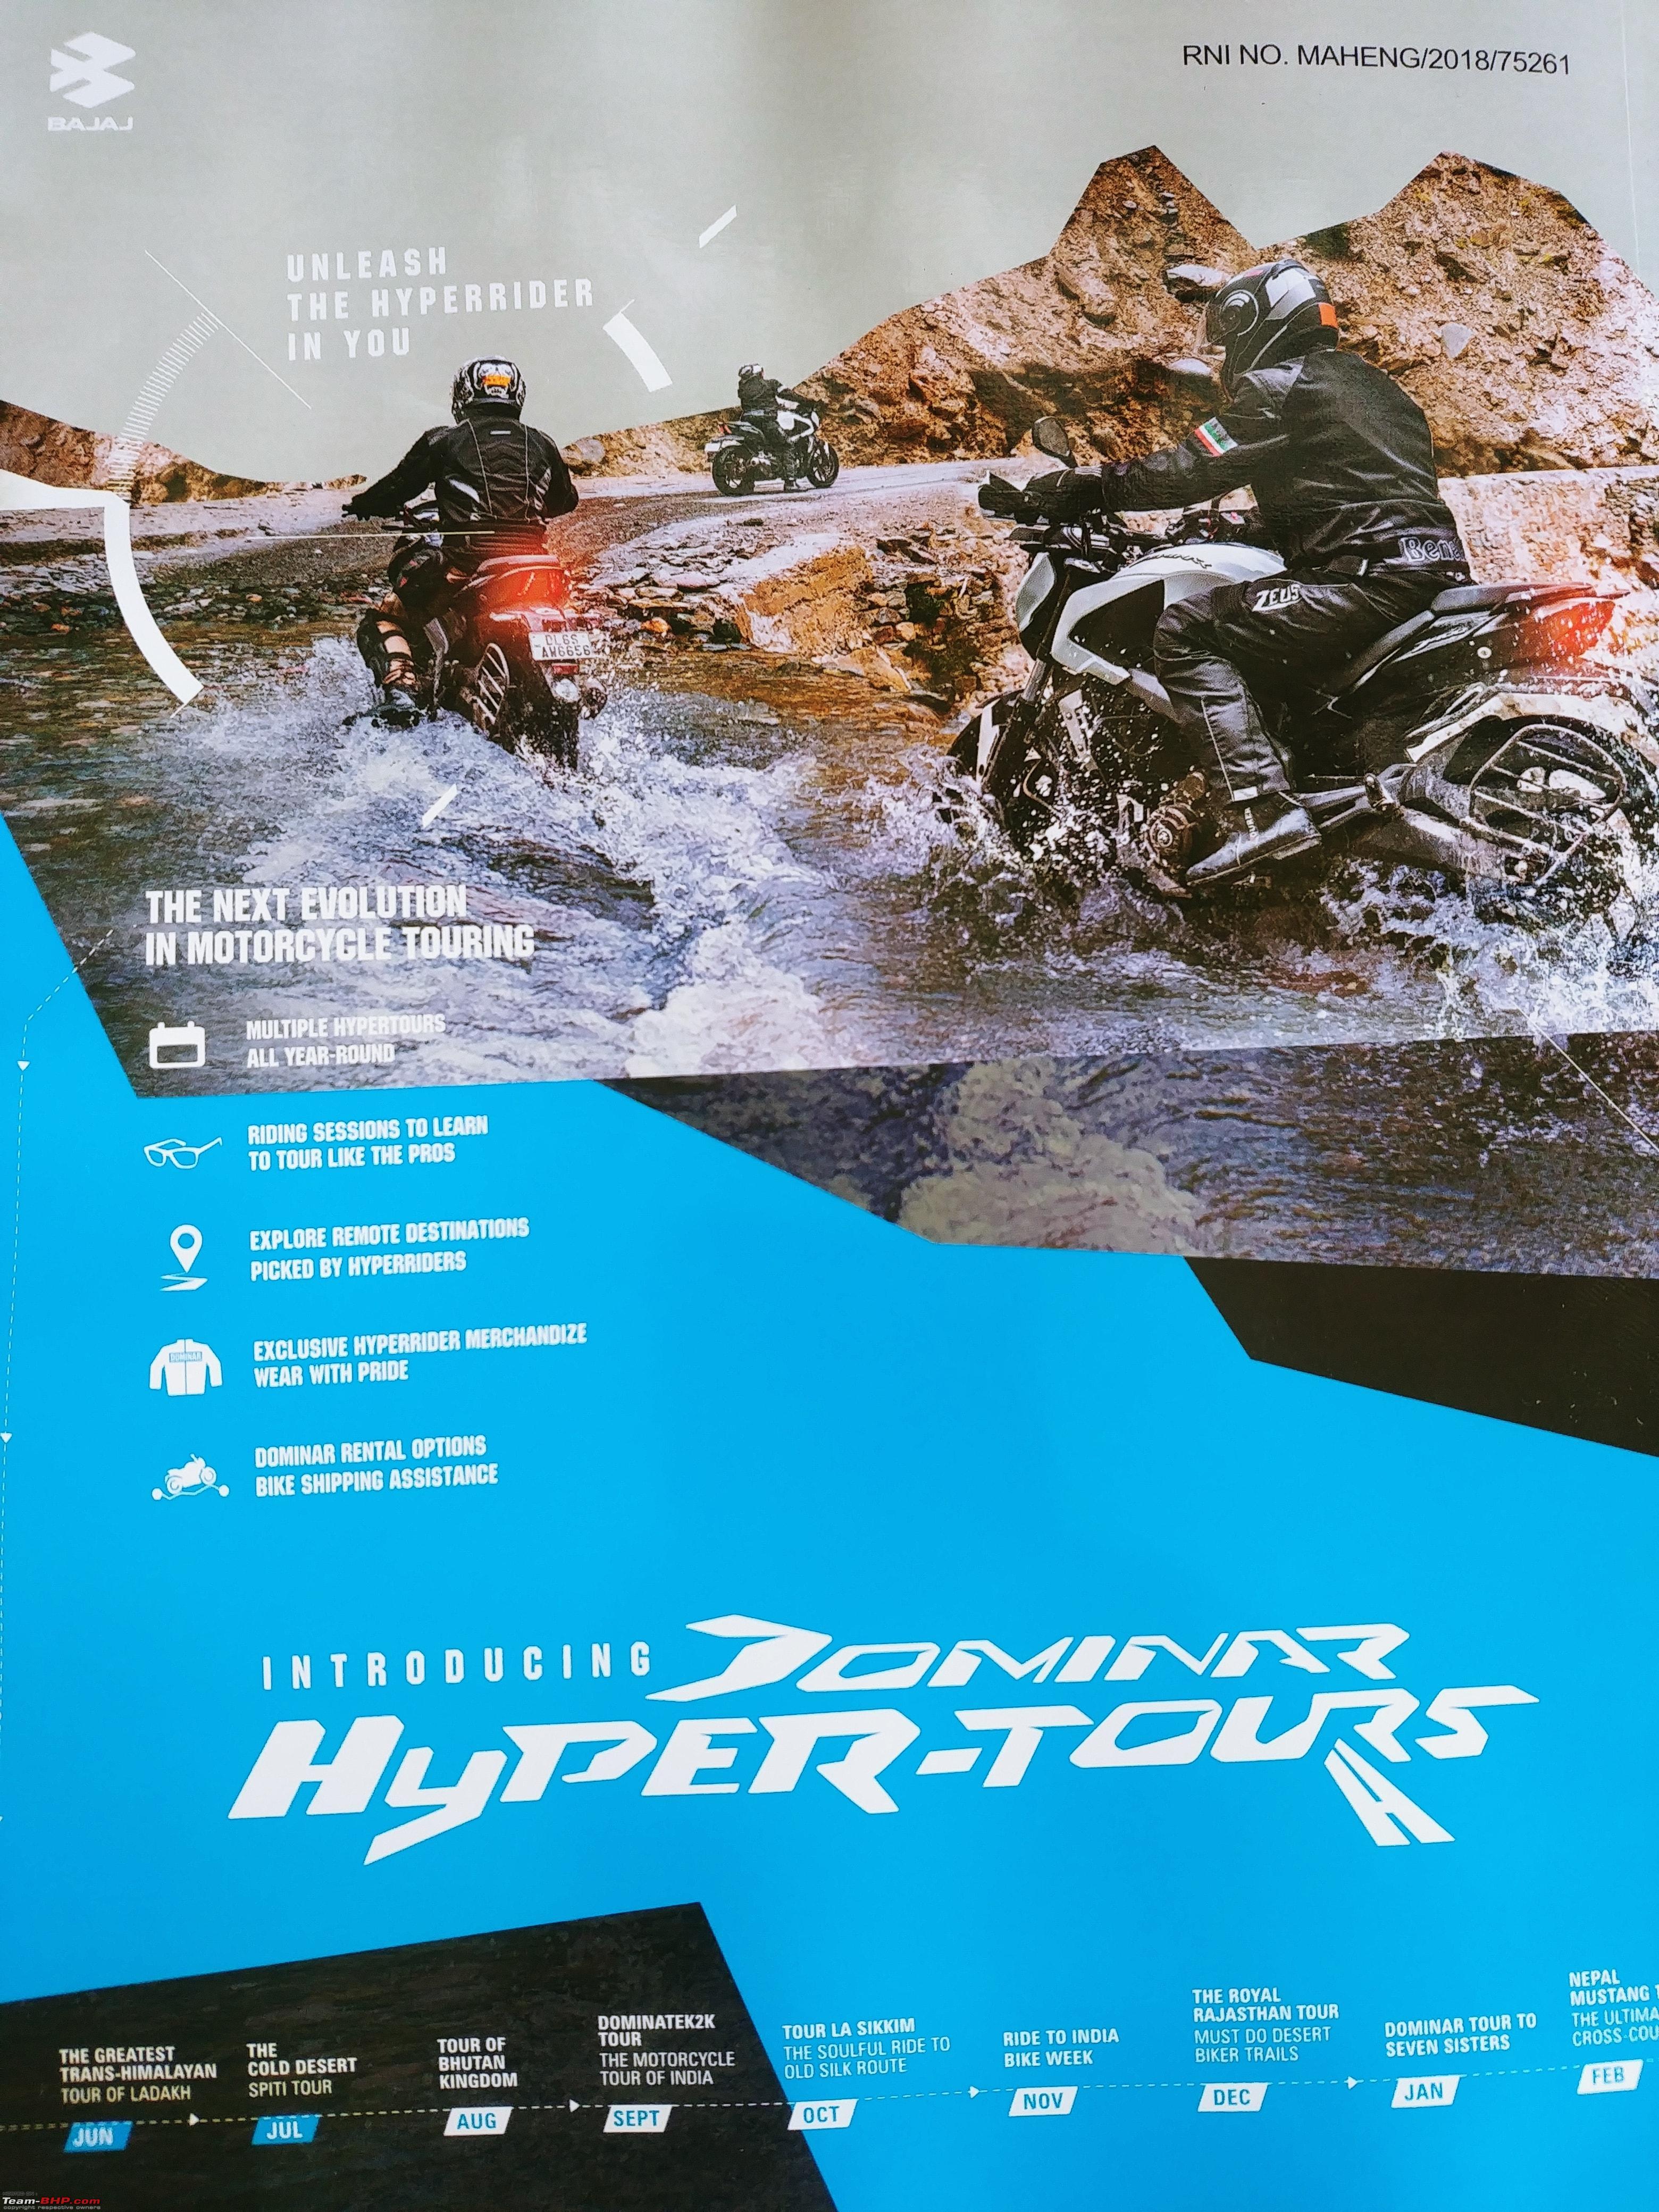 Ridden: Bajaj Dominar 400 - Page 33 - Team-BHP